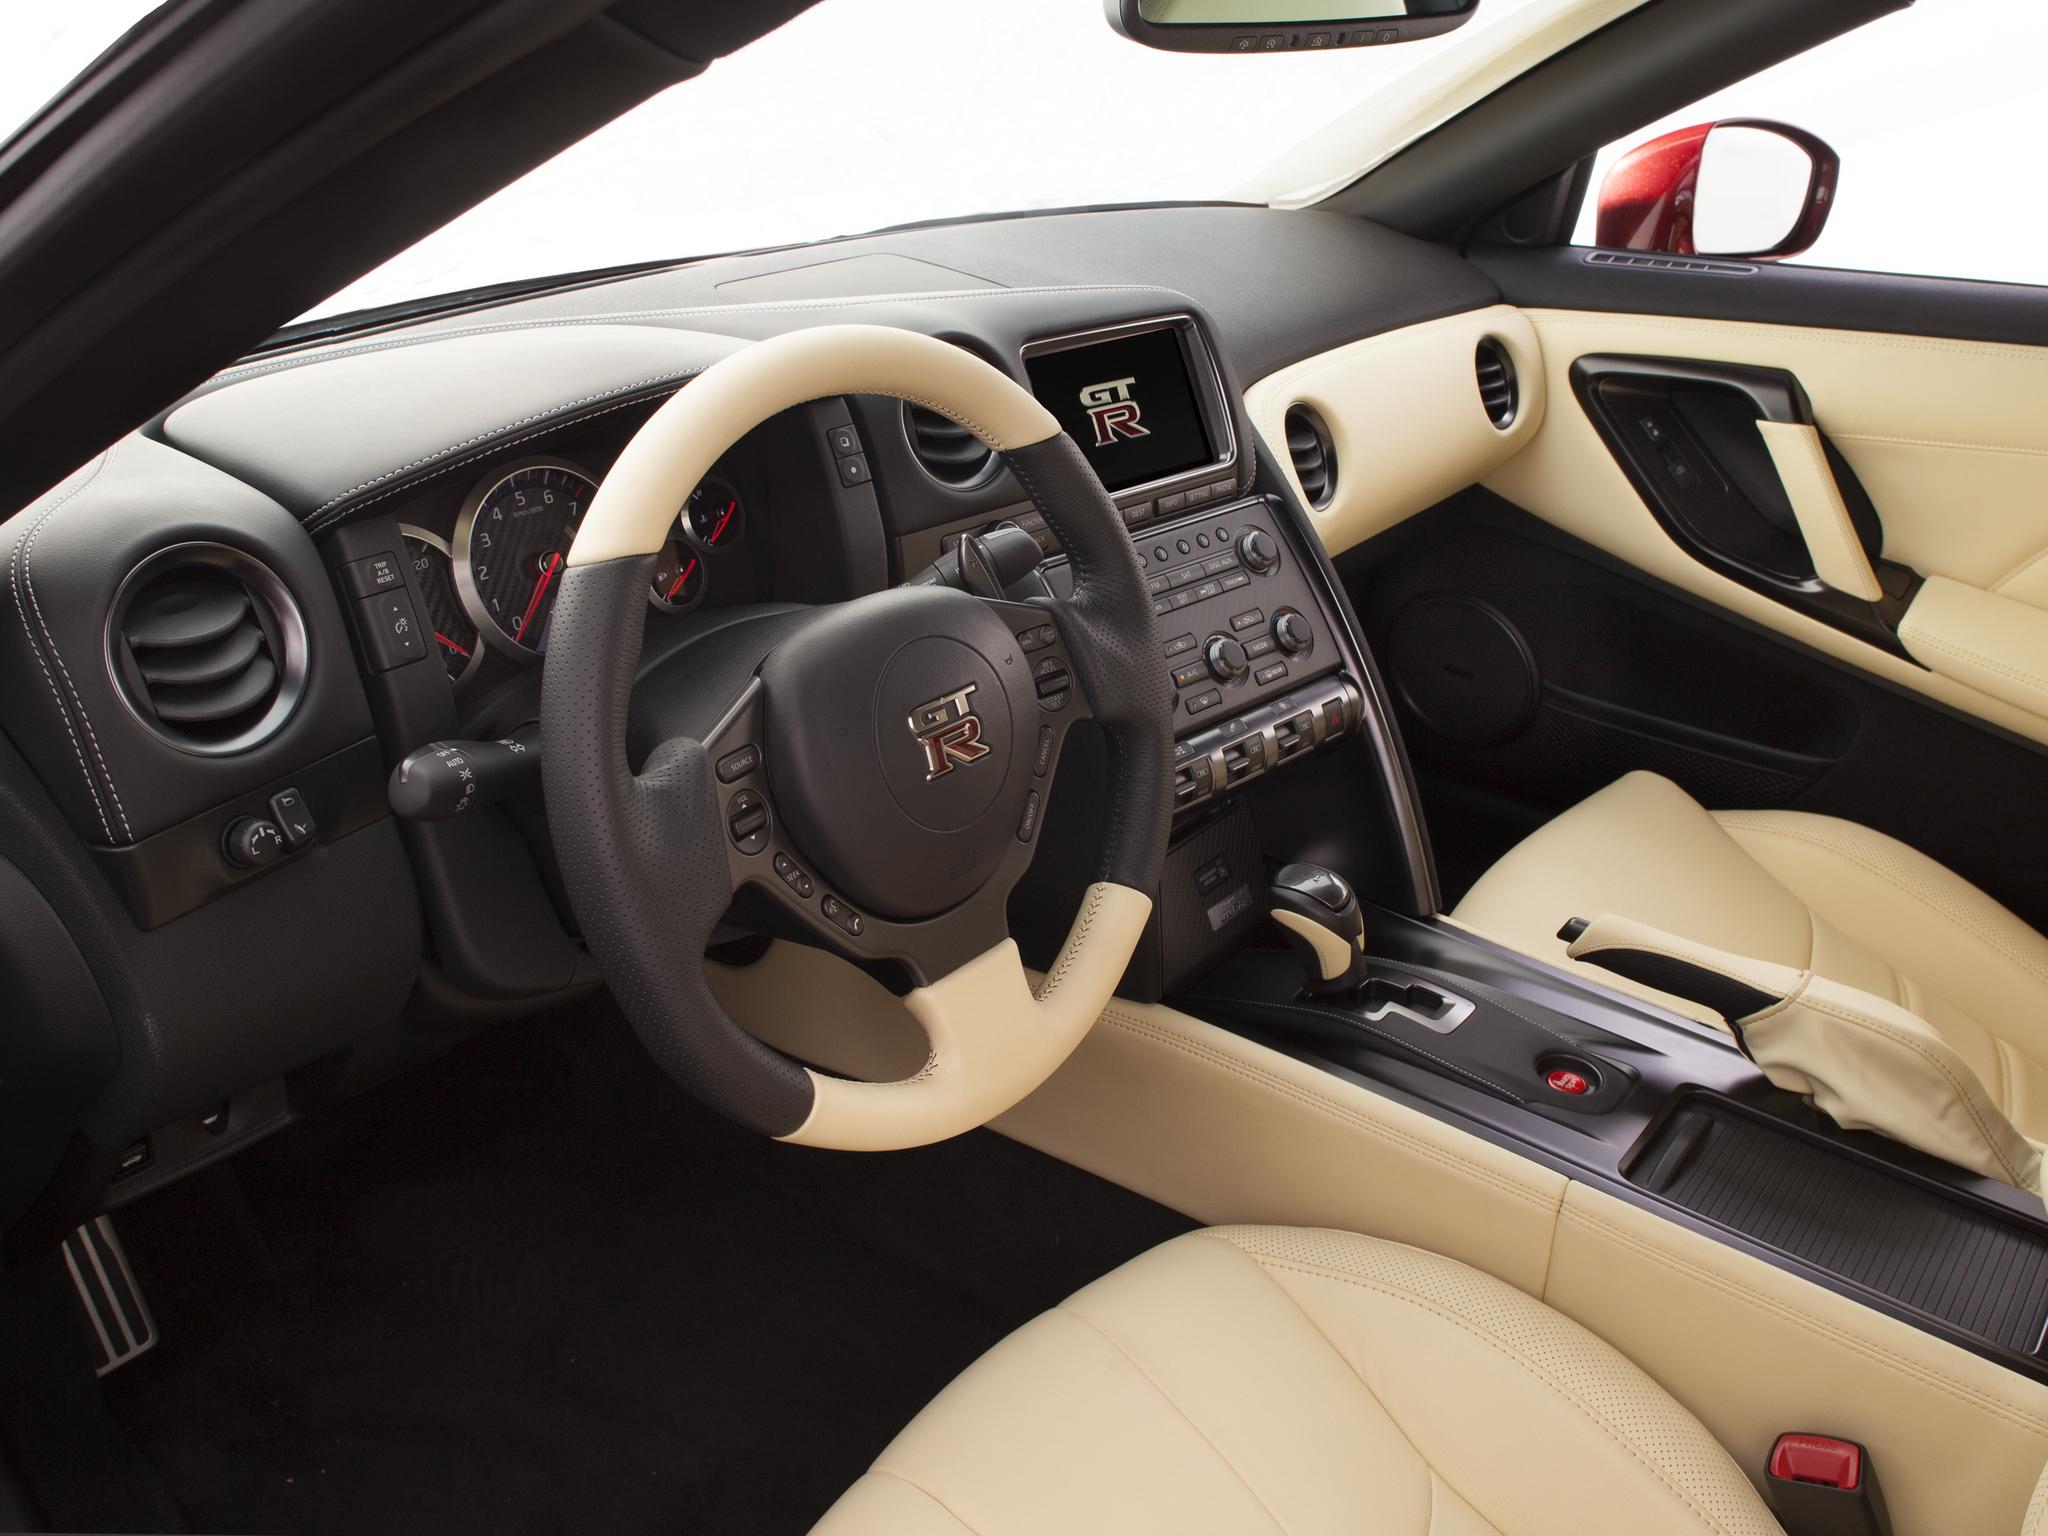 Amazing 2014 Nissan GT R US Spec (R35) Supercar Interior G Wallpaper | 2048x1536 |  178305 | WallpaperUP